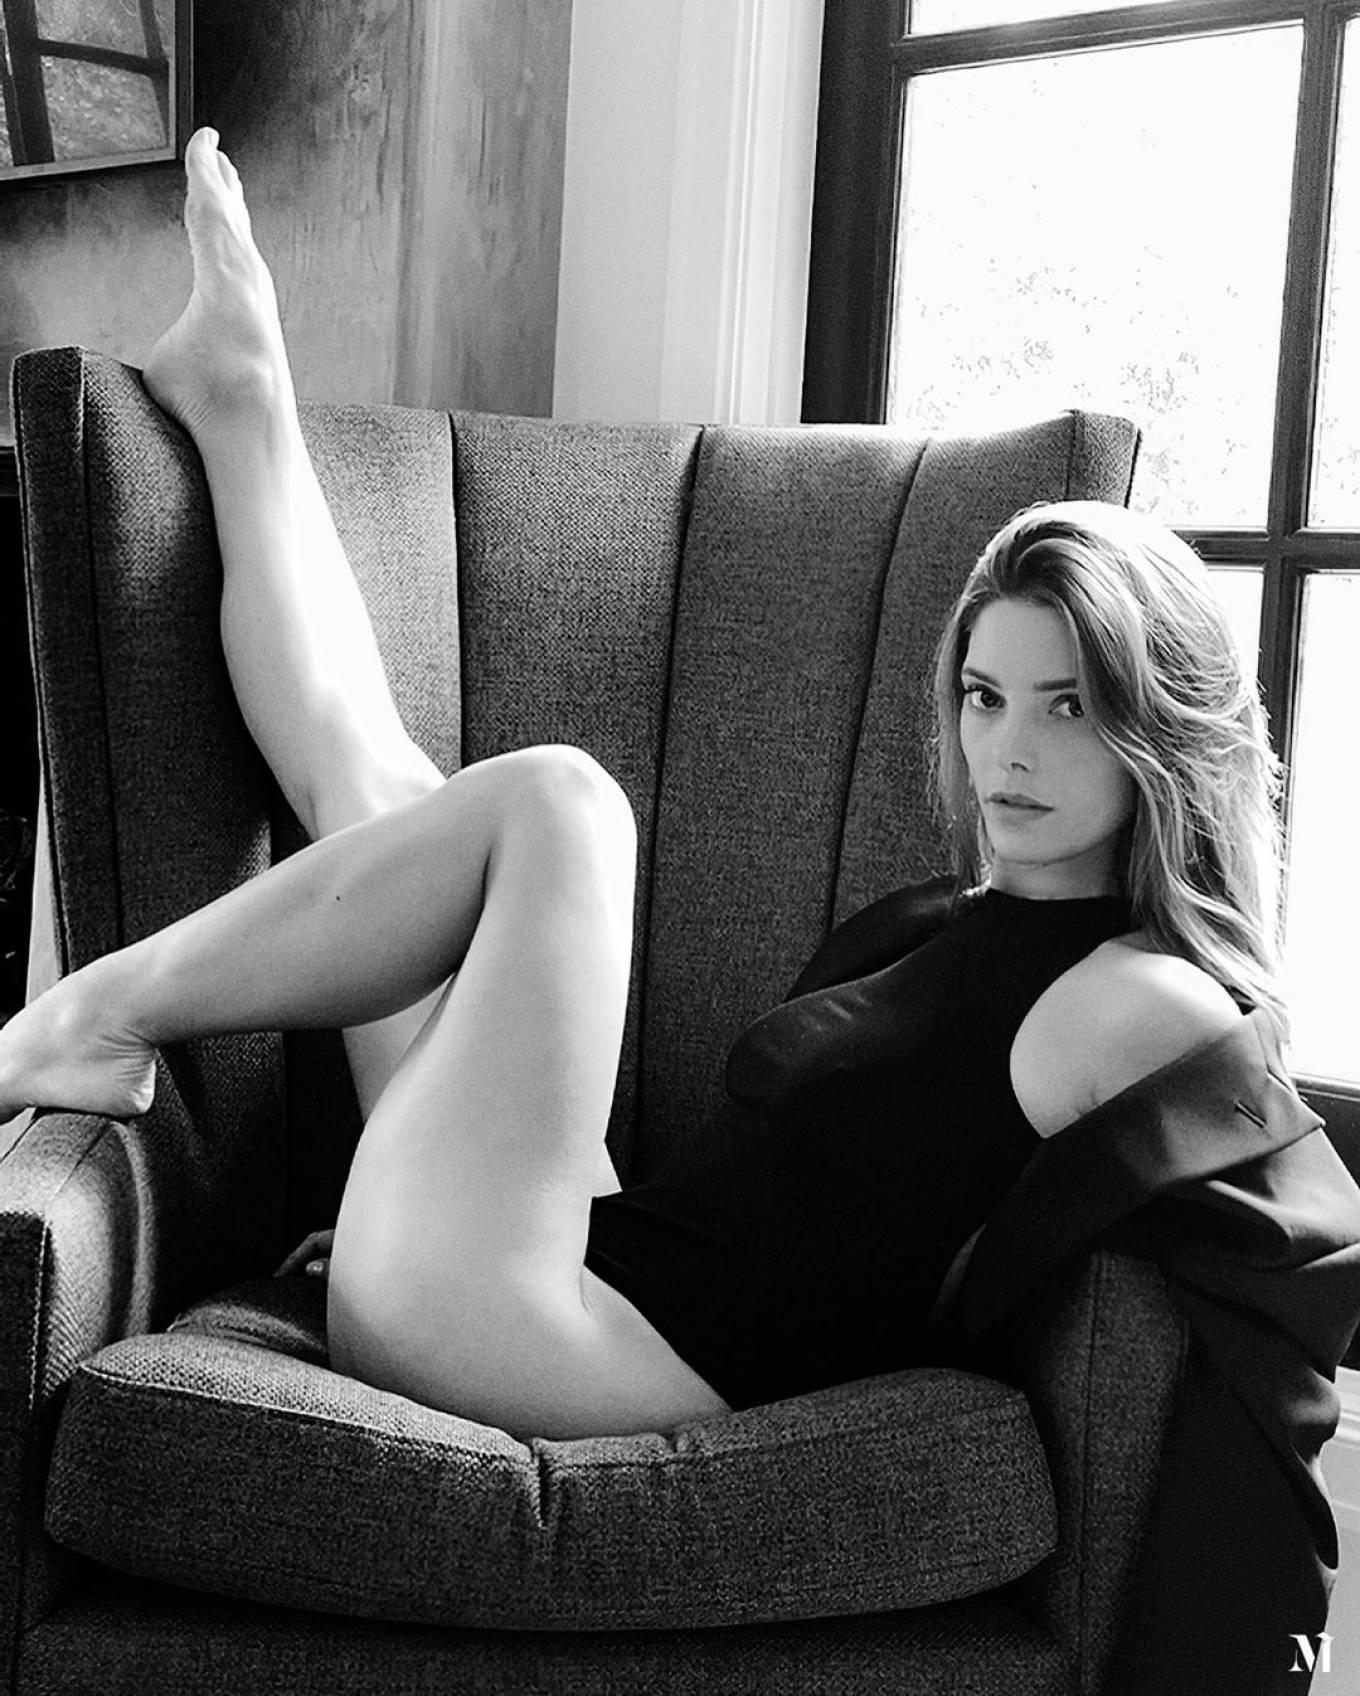 Ashley Greene 2020 : Ashley Greene – Revista de Milenio magazine (Issue 03 – 2020)-01